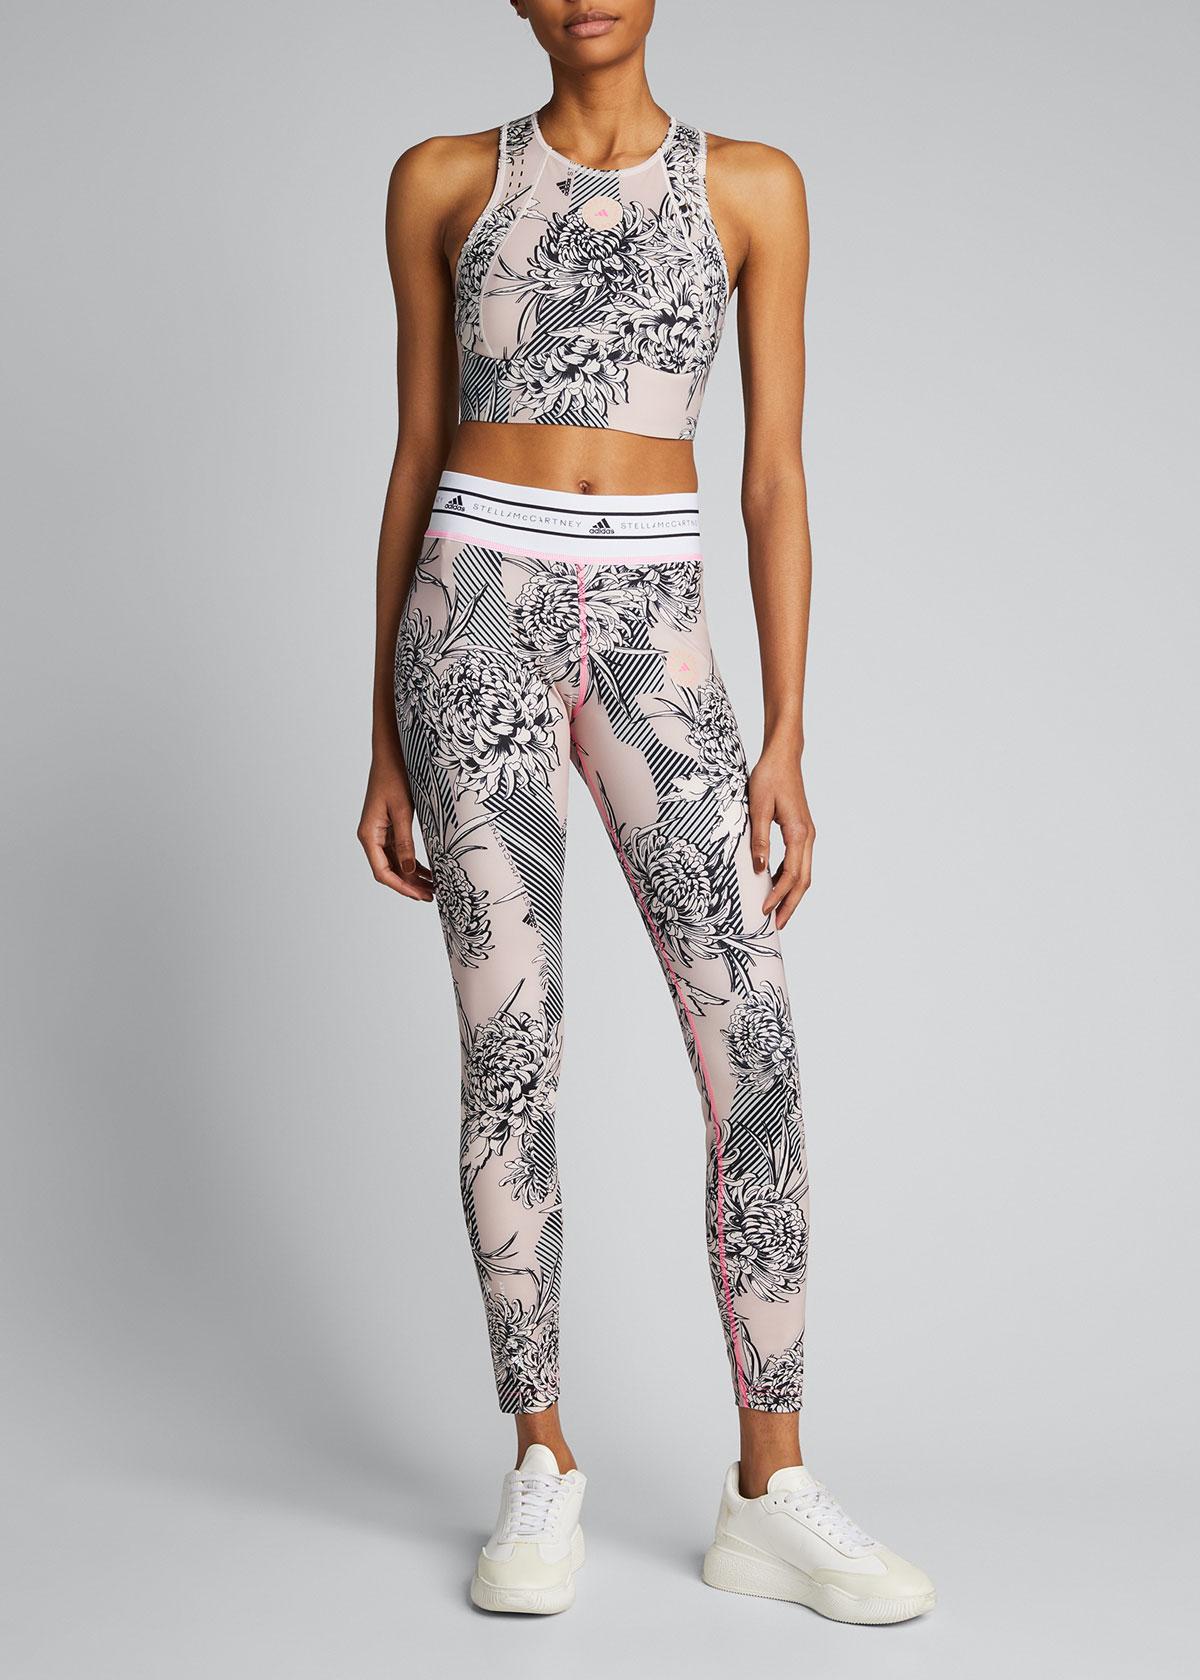 Adidas By Stella Mccartney Leggings FUTURE PLAYGROUND BANDED-WAIST PRINTED LEGGINGS